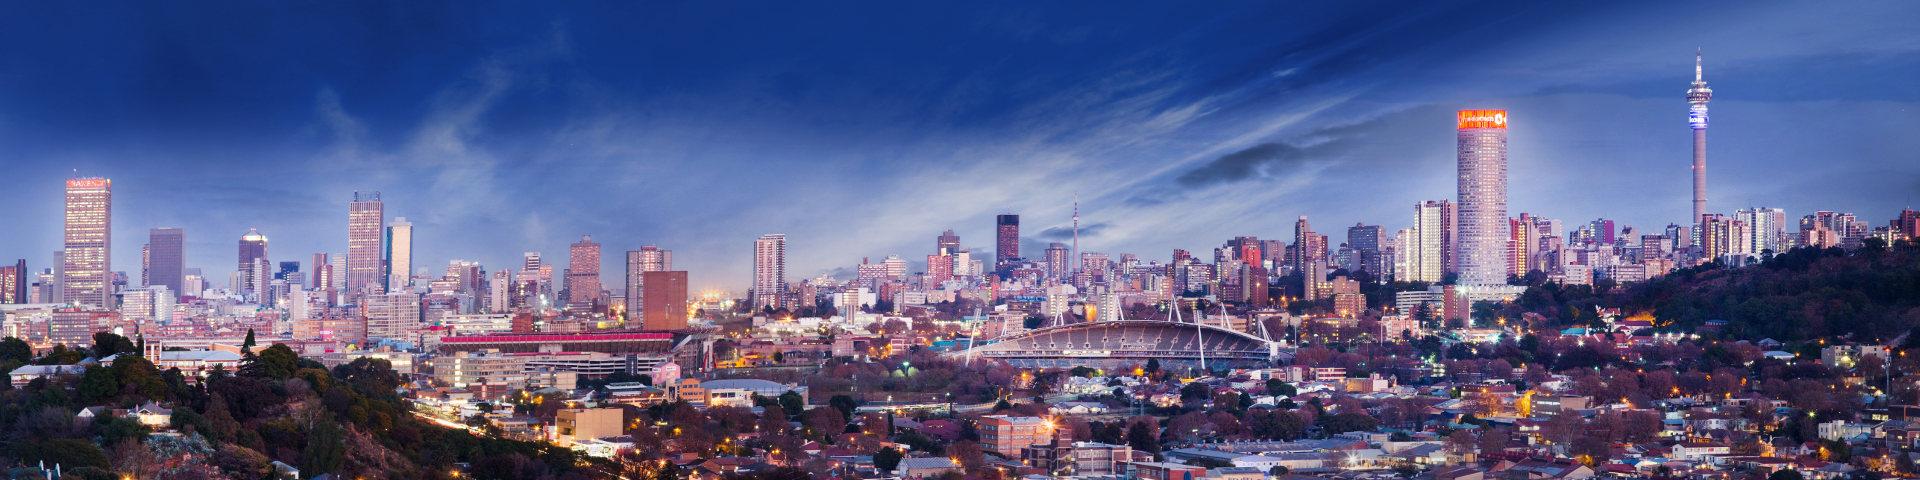 Johannesburg hero 1